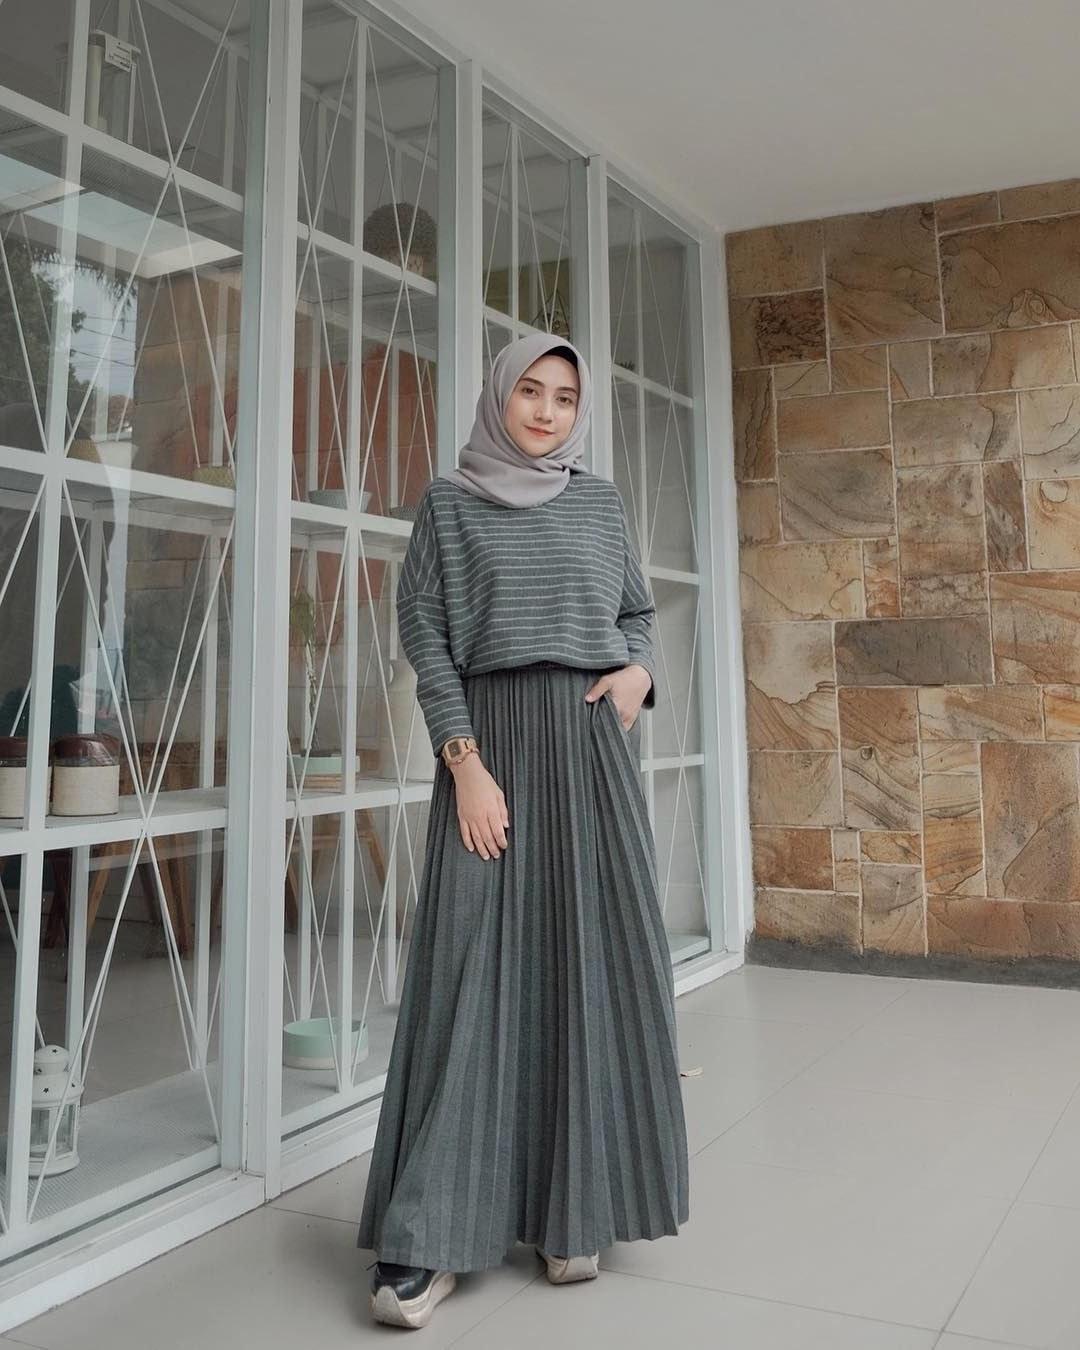 Model Baju Lebaran Terbaru 2019 Wanita 3ldq Baju Muslim Lebaran Terbaru 2019 Dengan Gambar